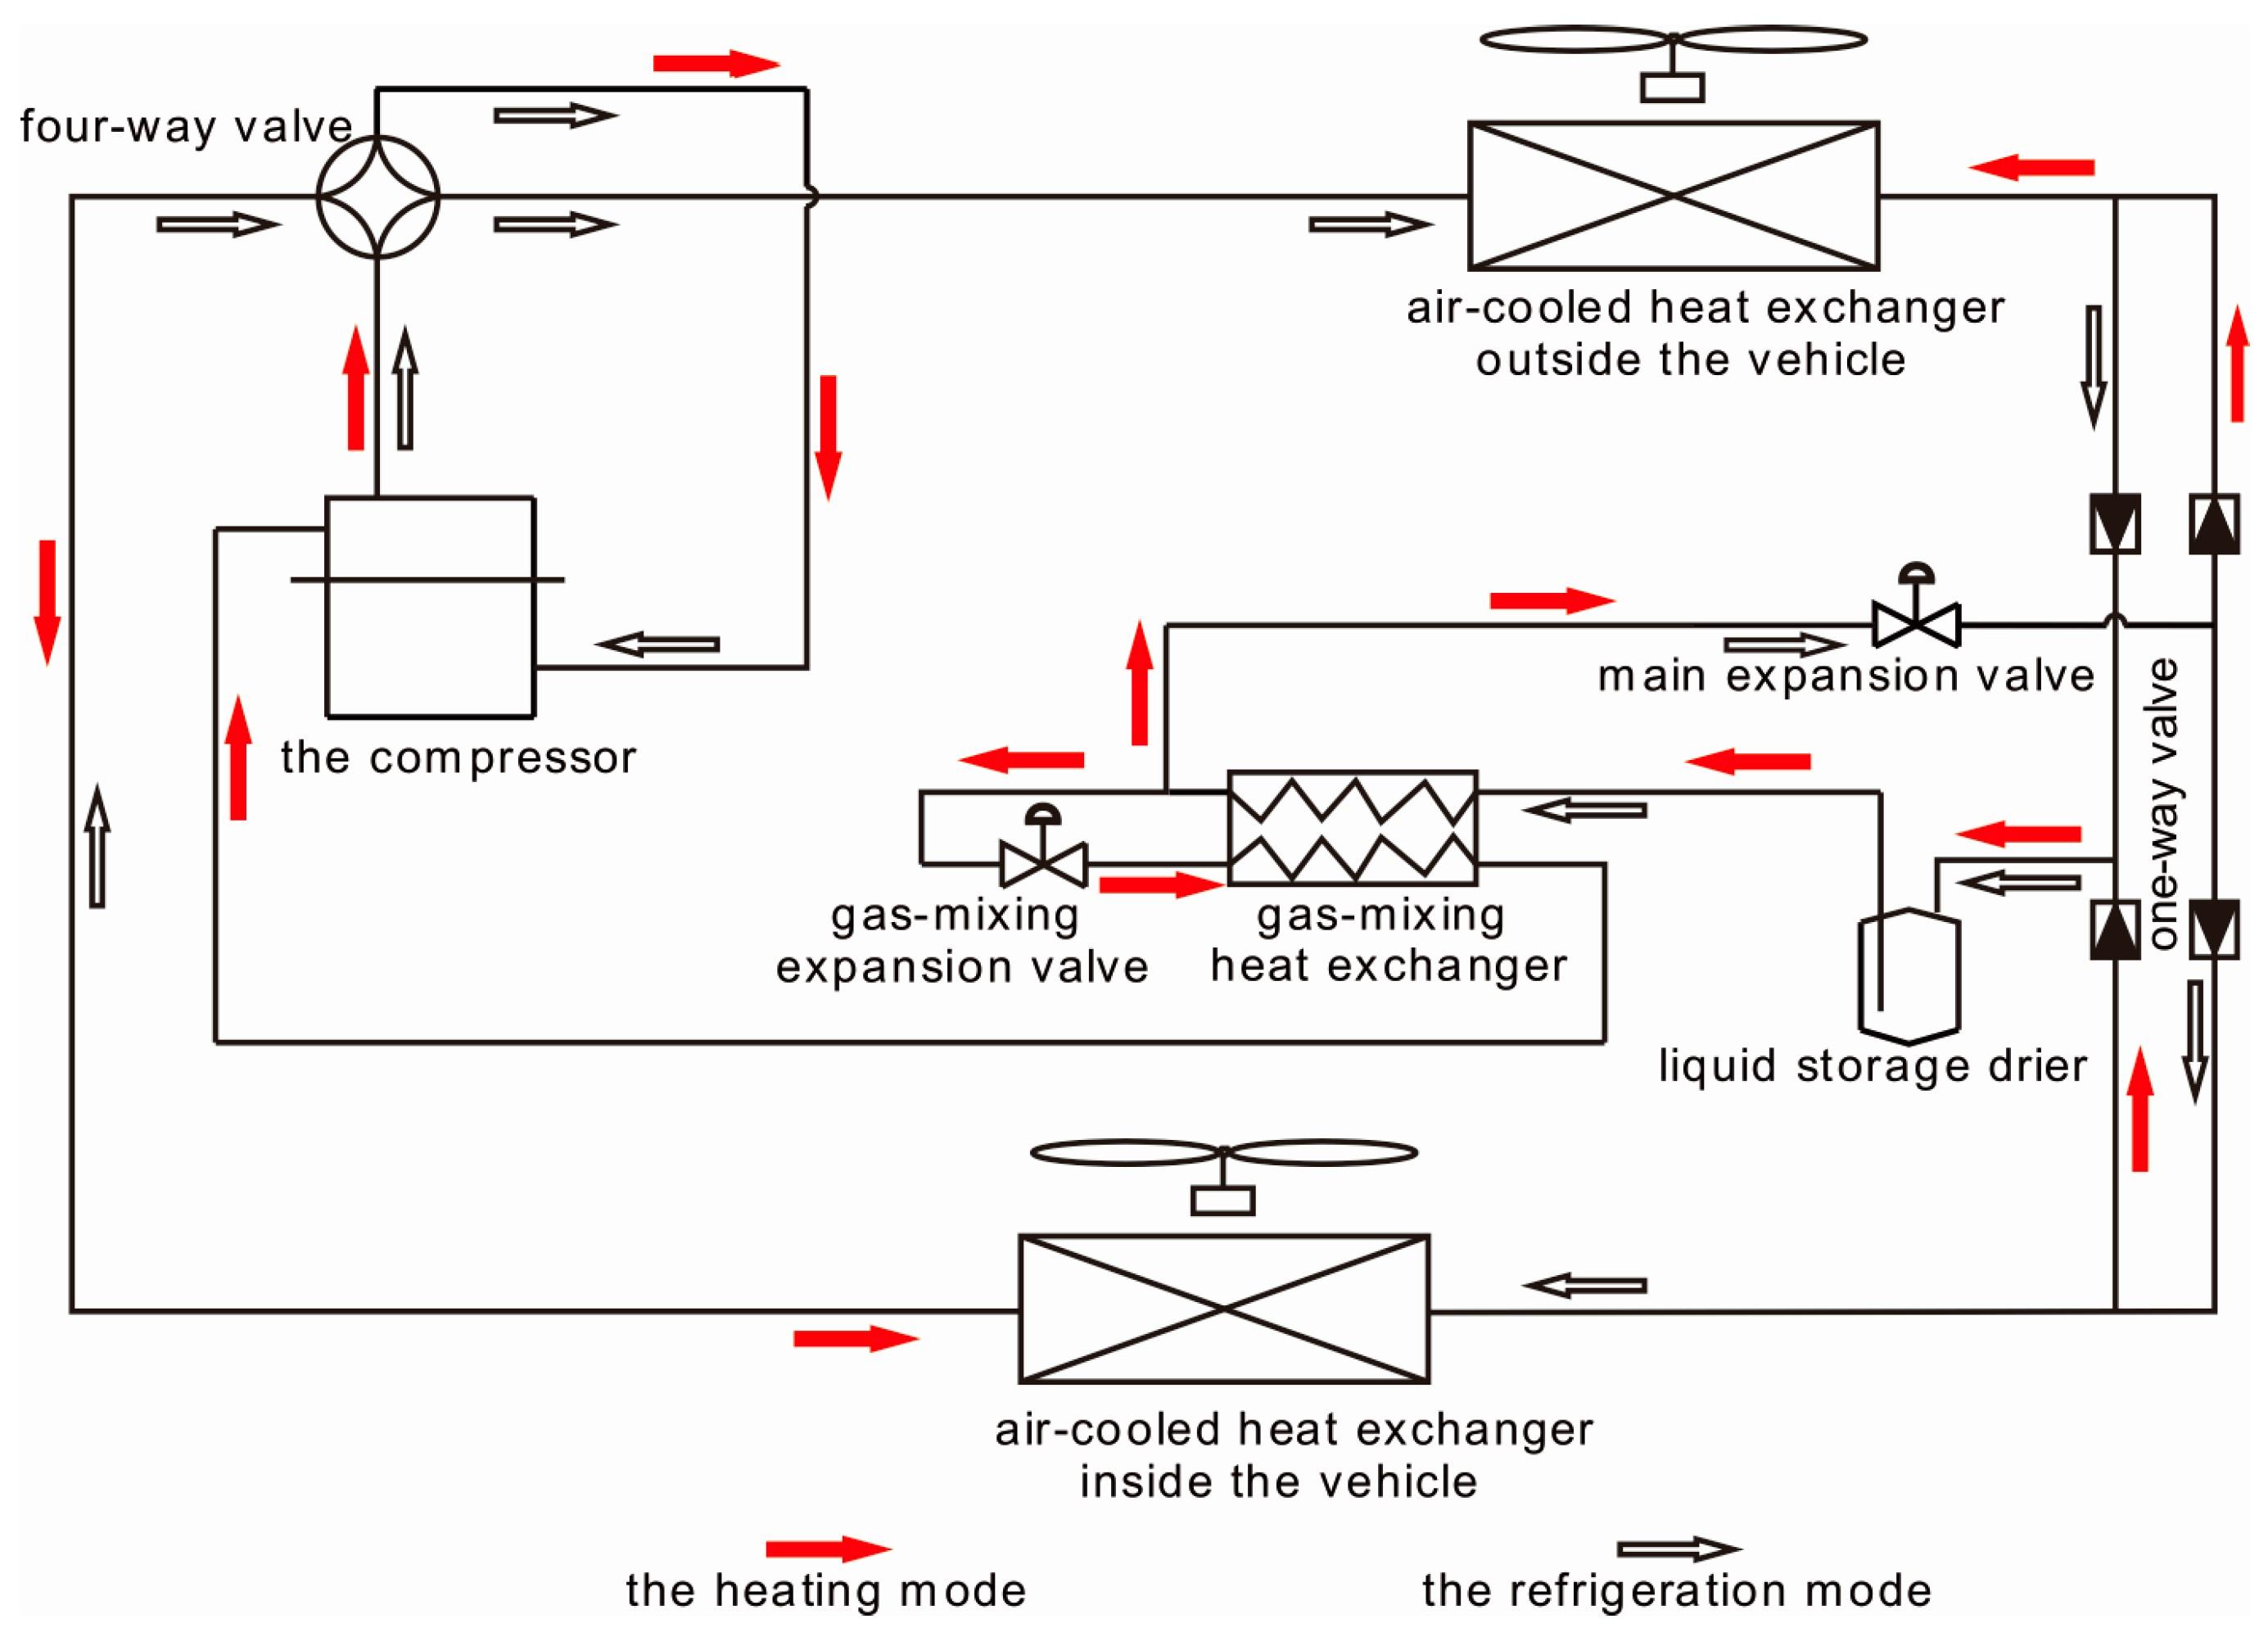 Diagram Of Car Heating System Energies Free Full Text Of Diagram Of Car Heating System